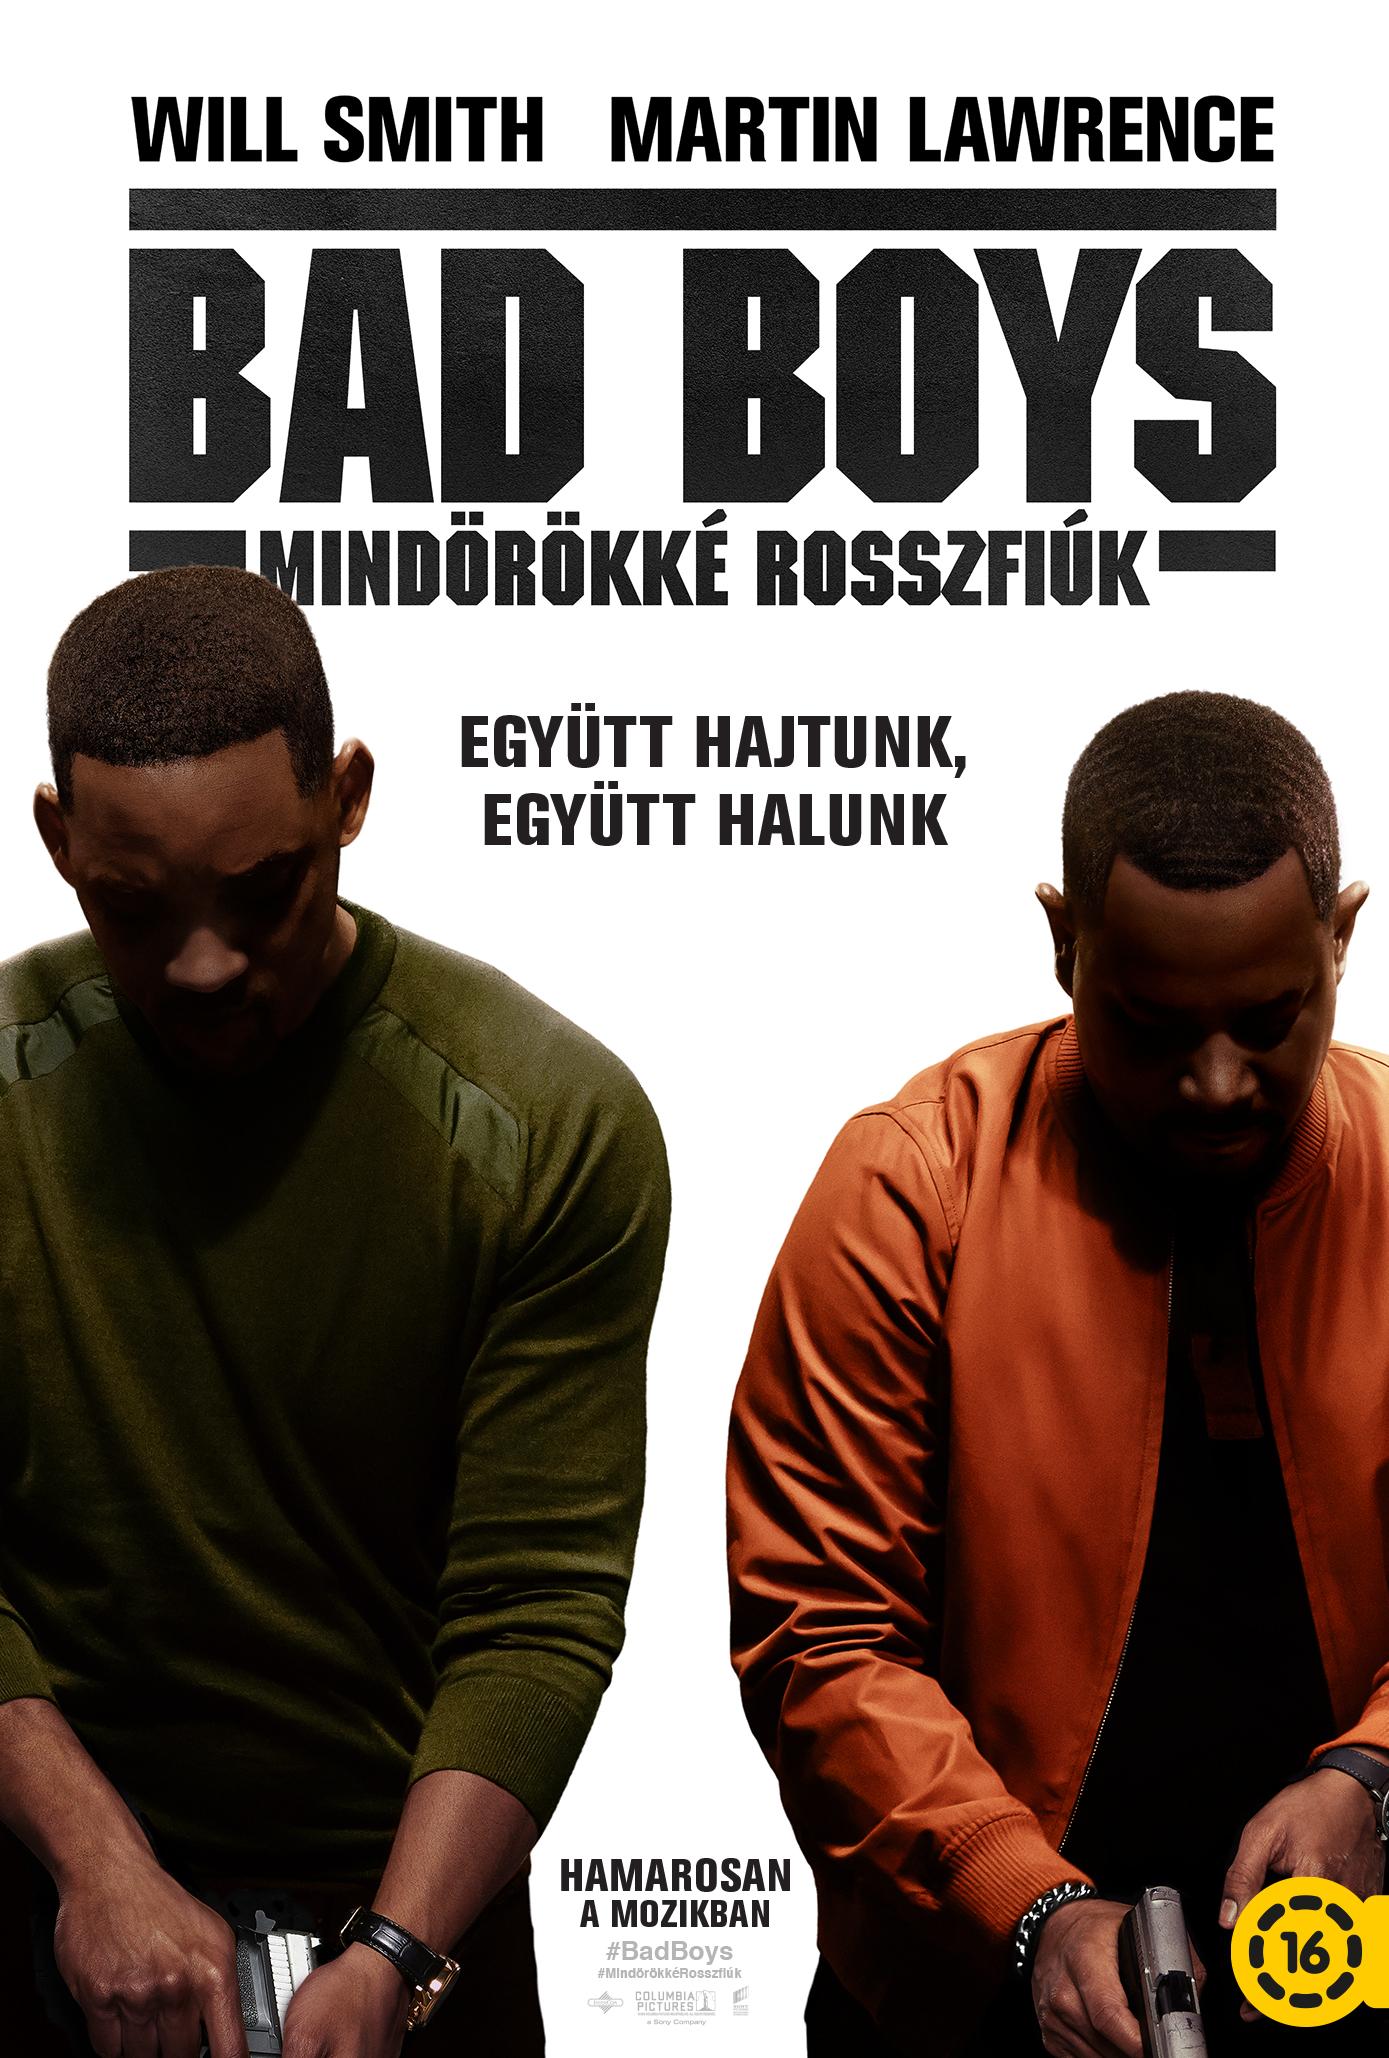 badboys3_hun_p1_1.png